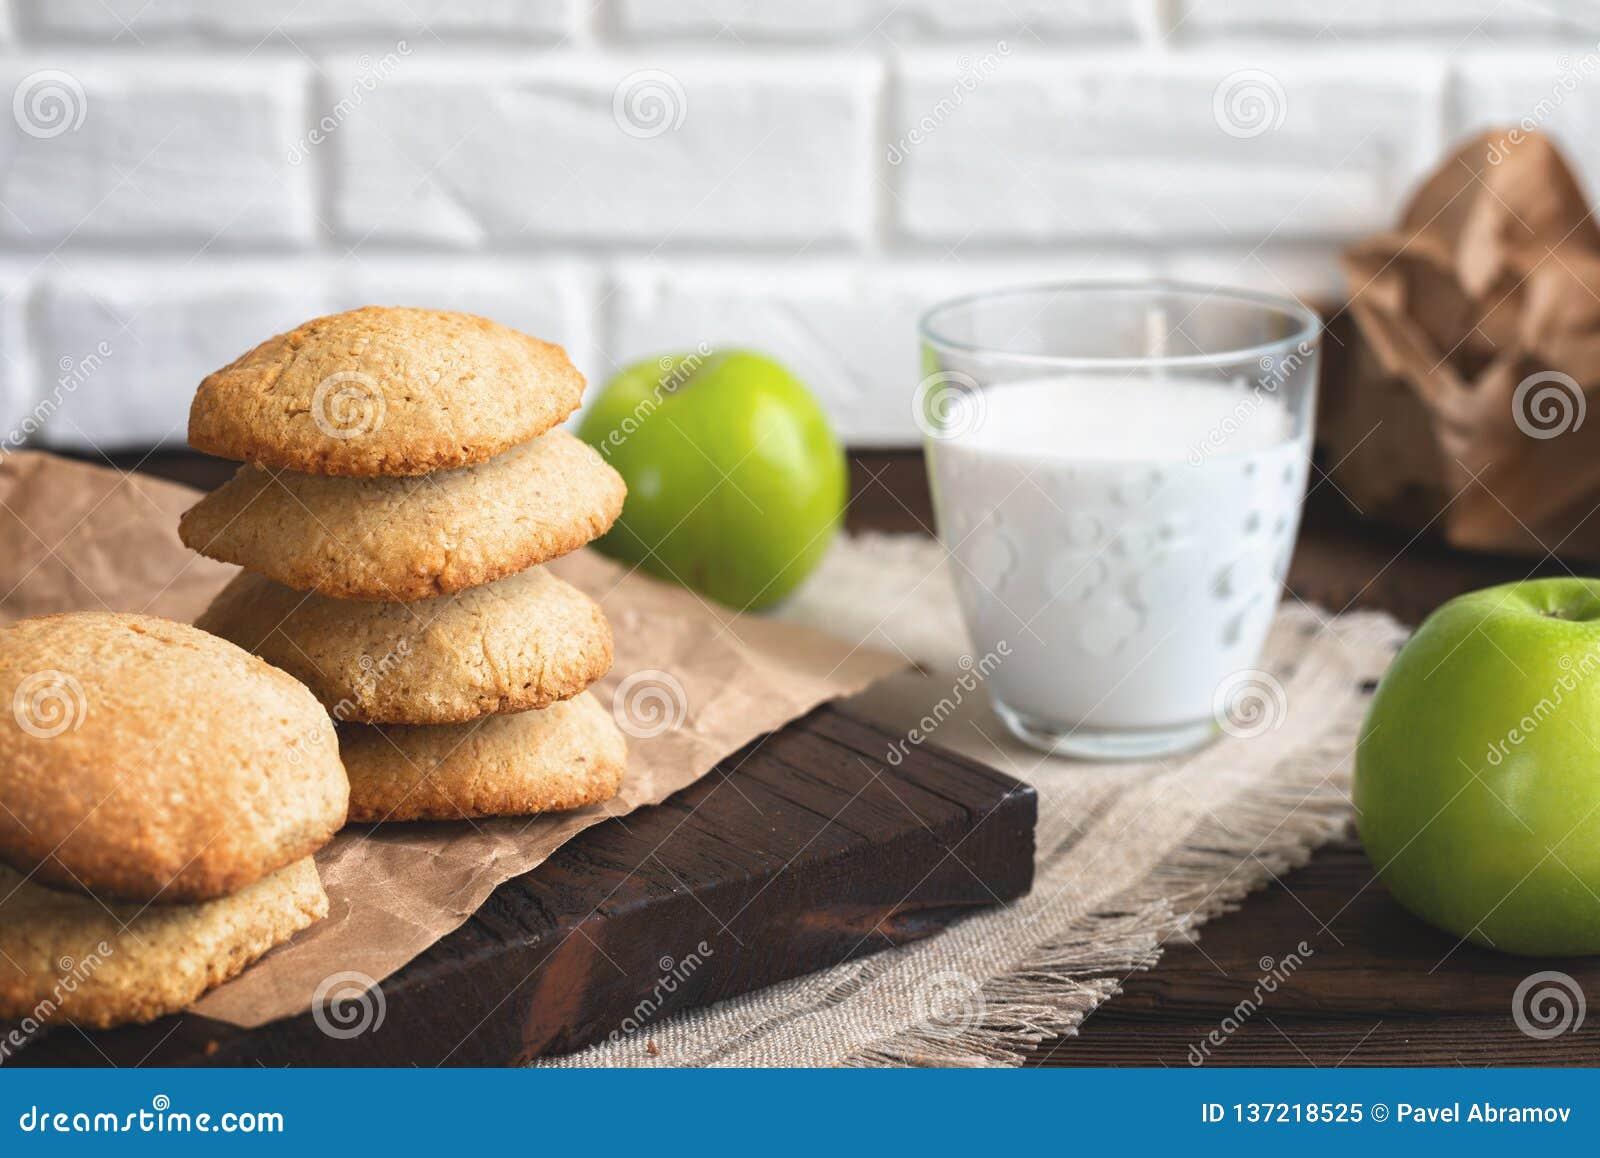 Daily healthy breakfast. Homemade oatmeal cookies, milk, fruit on dark background